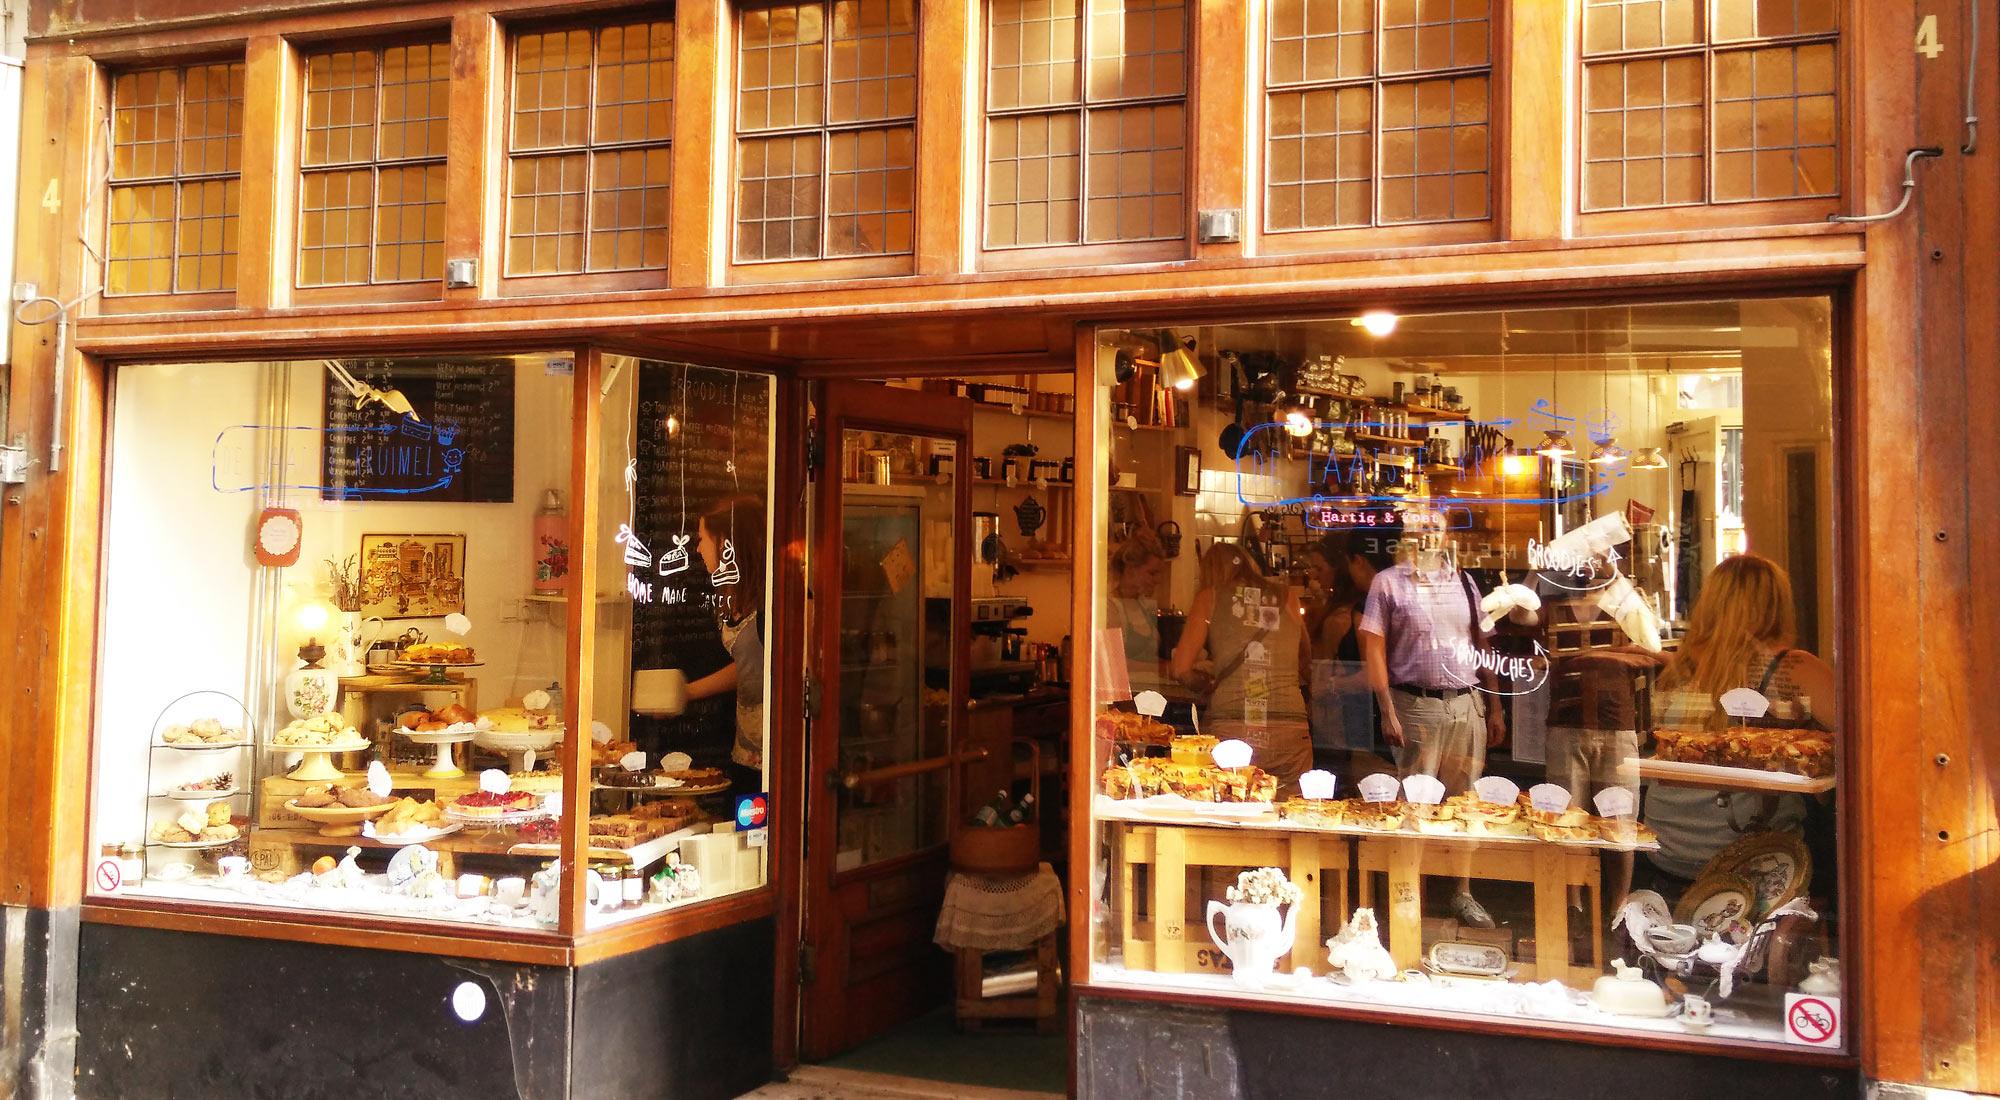 Bäckerei De Laatste Kruimel in Amsterdam